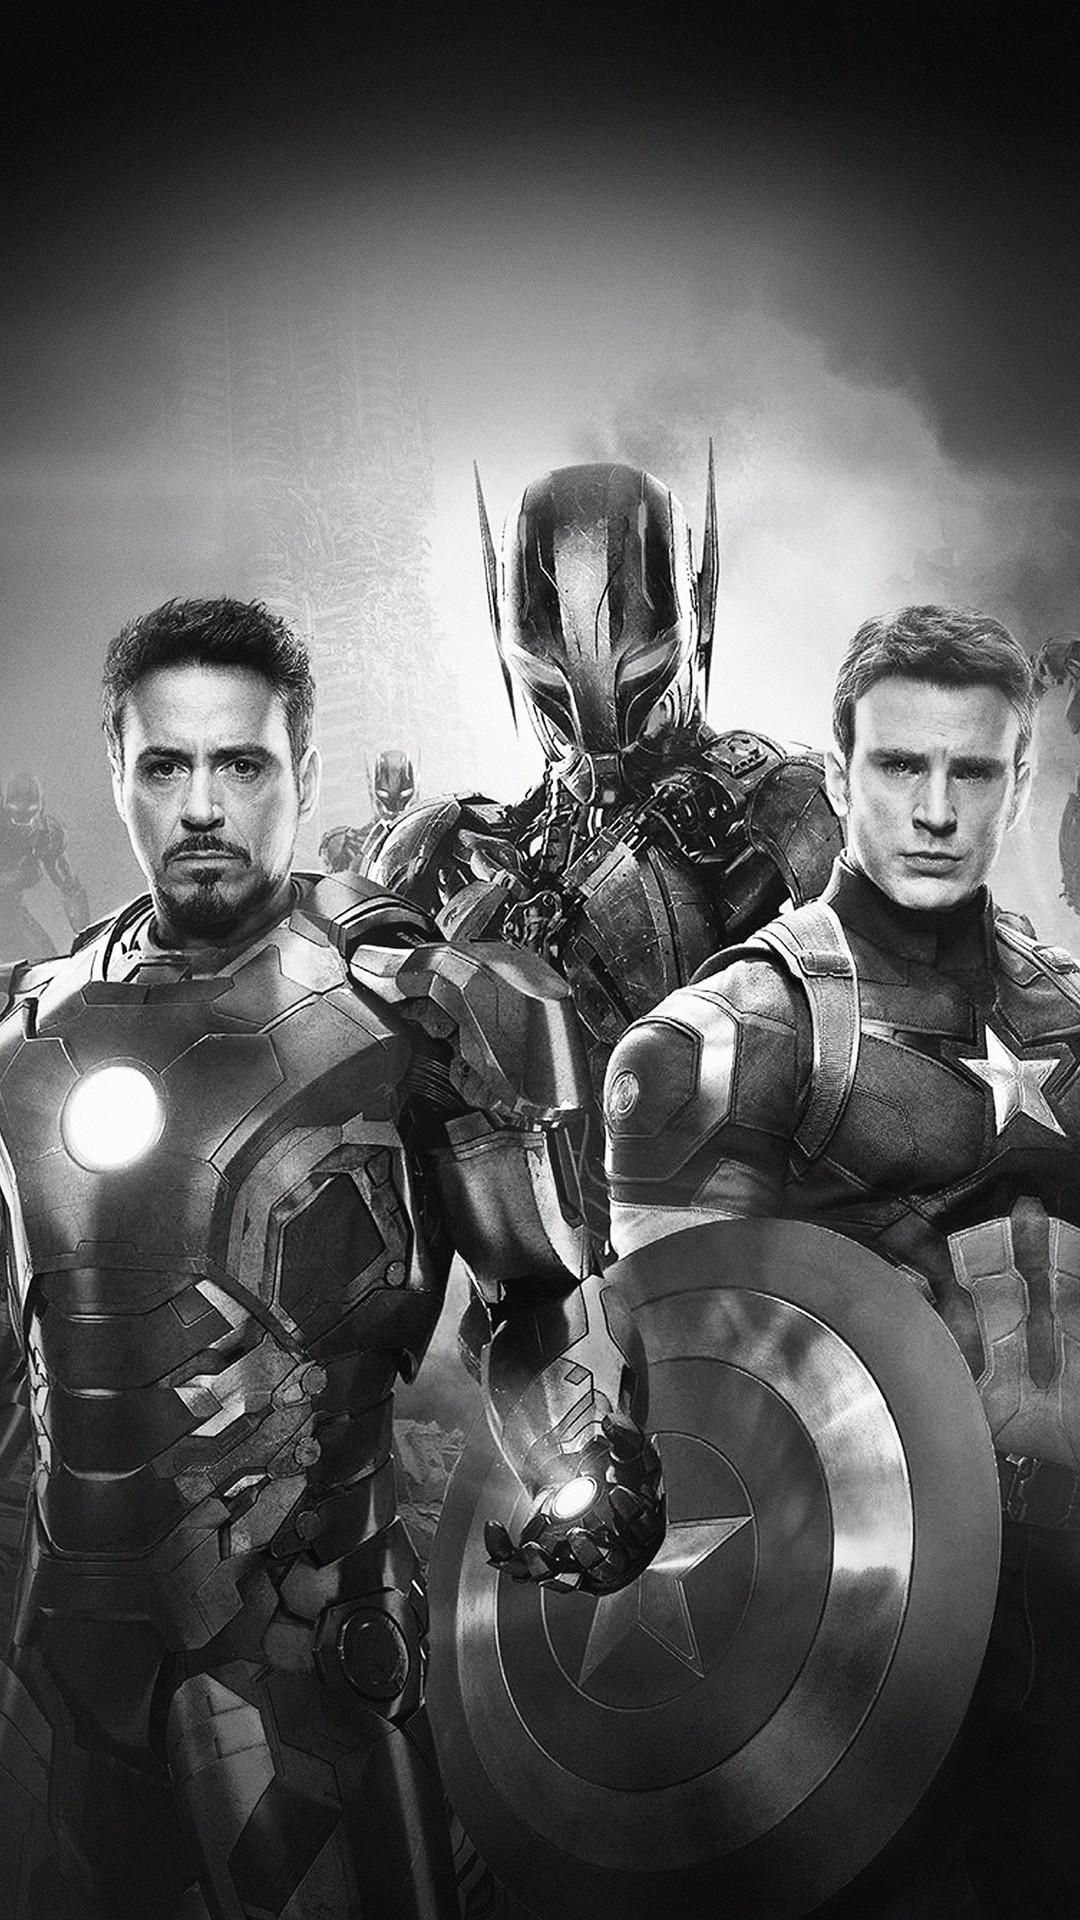 Avengers Poster-Dark Age Of Ultron Art Film #iPhone #6 #plus #